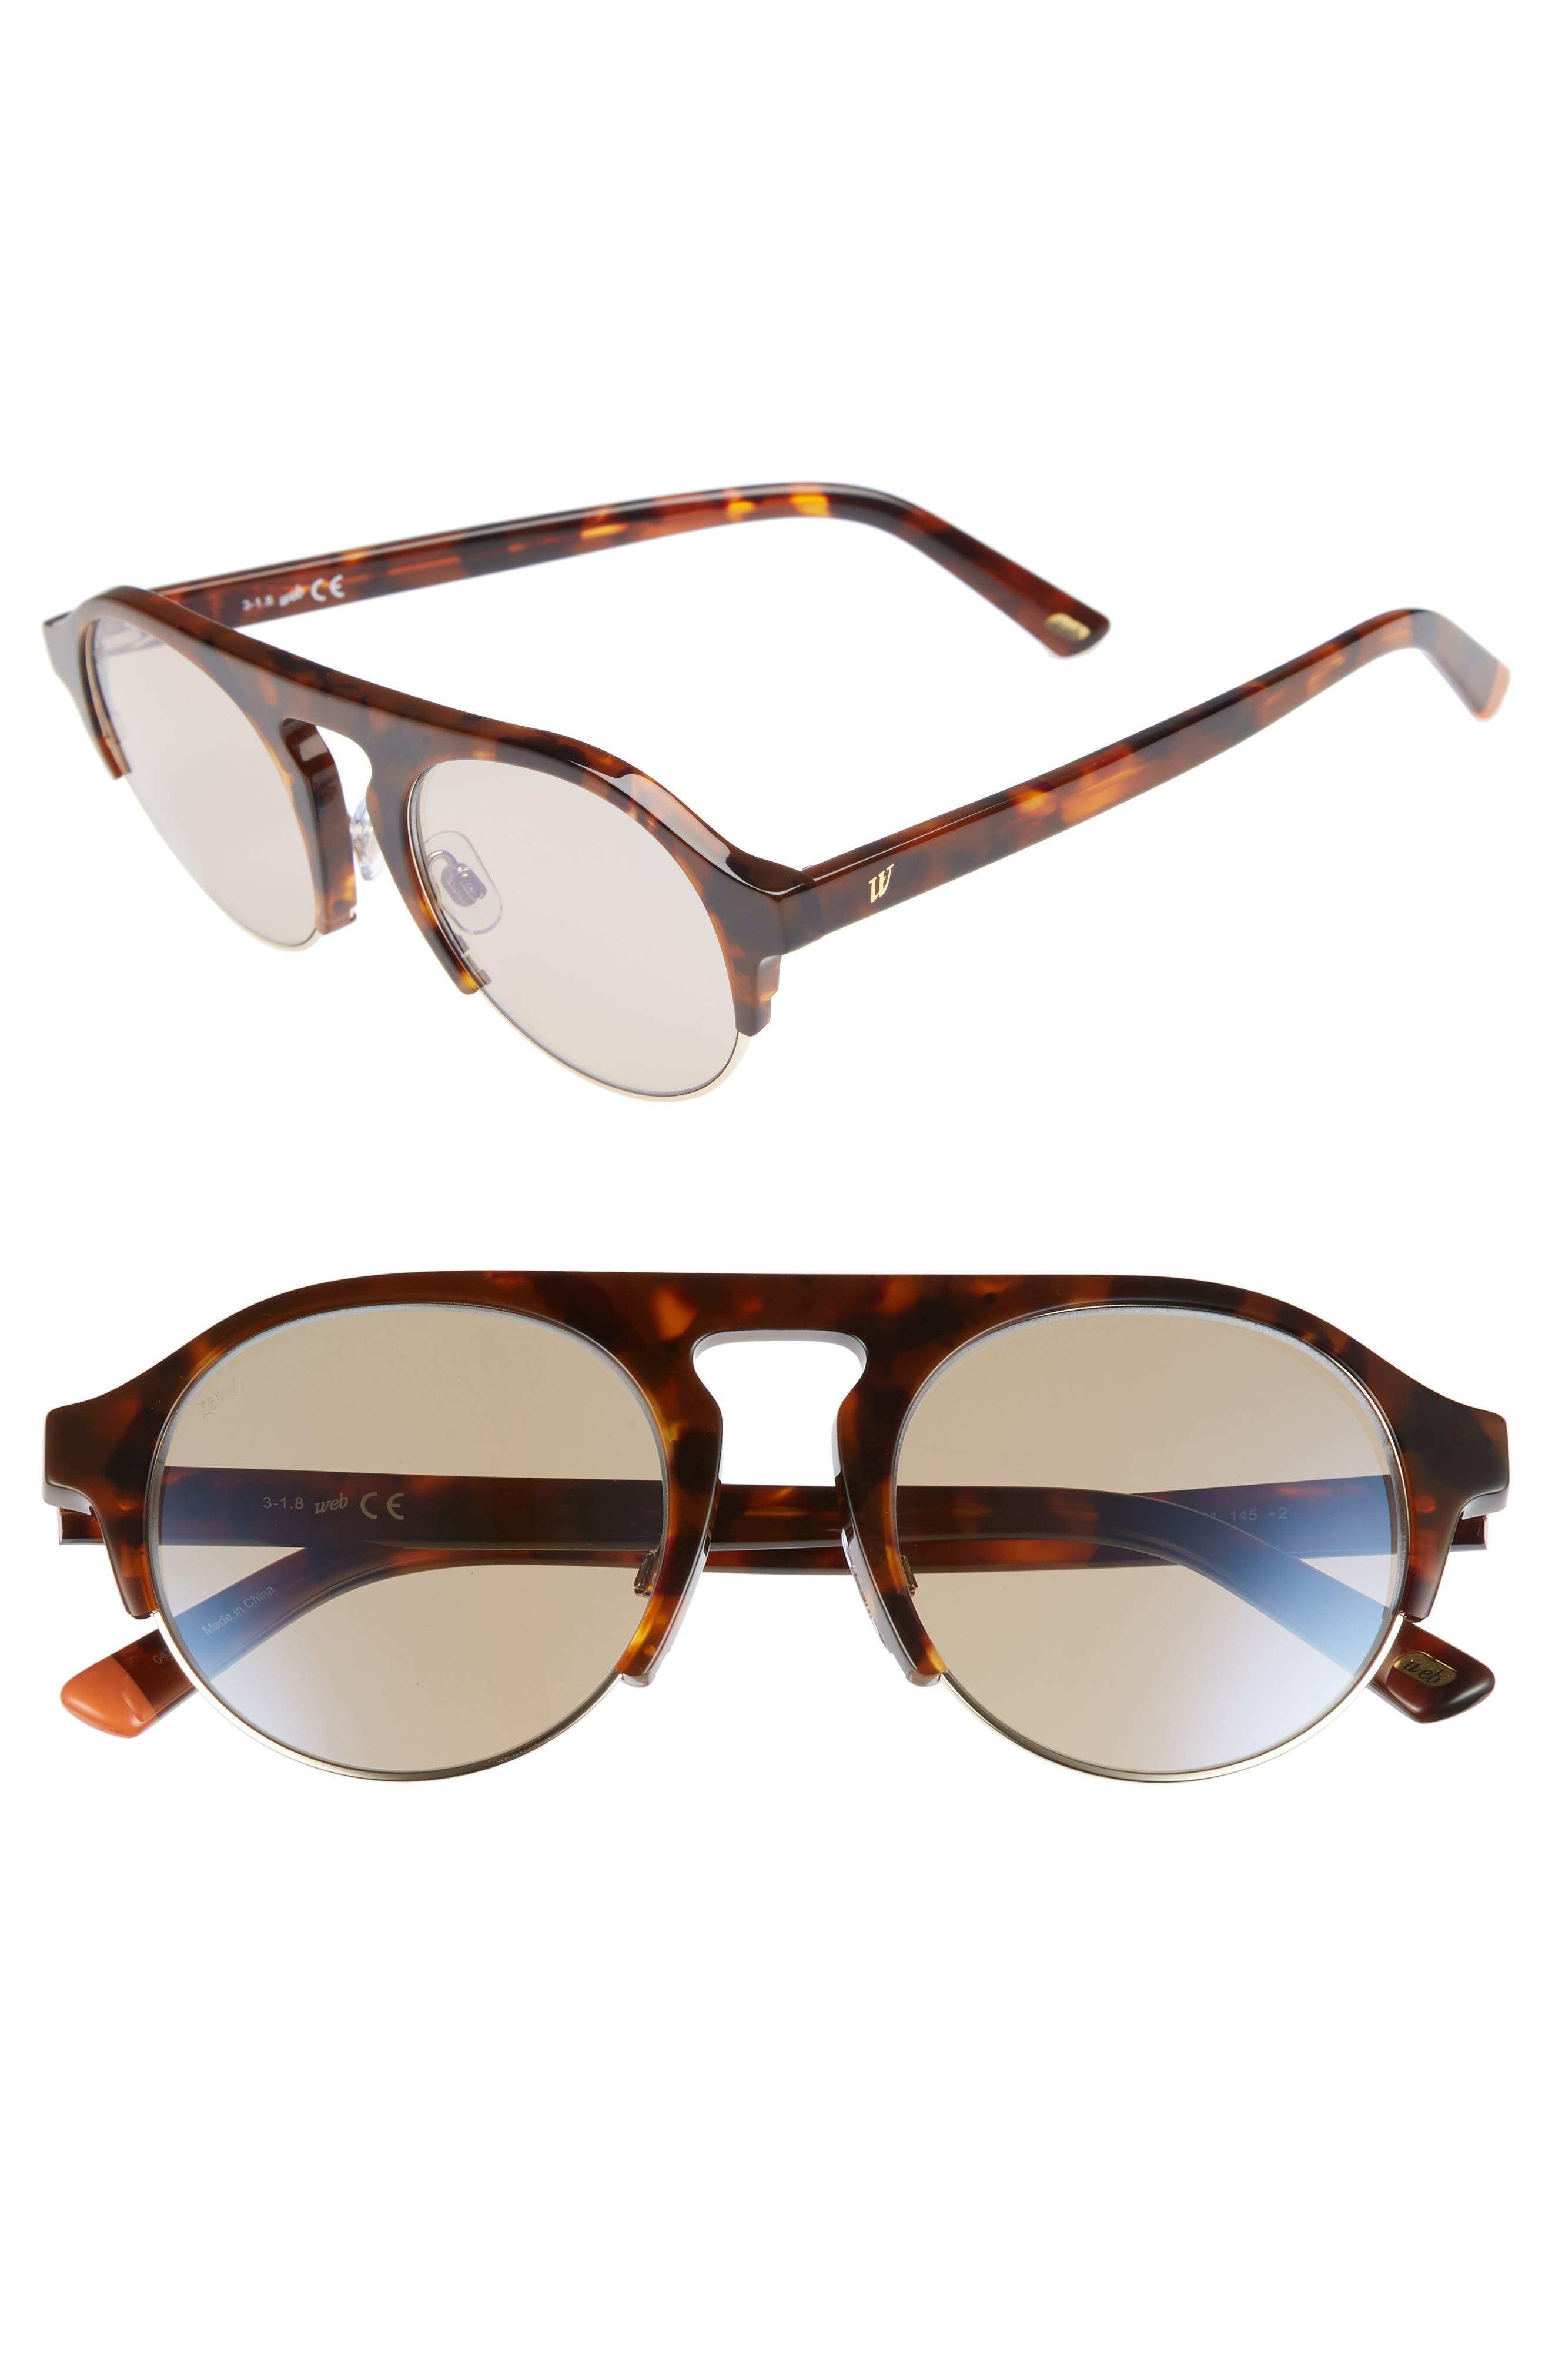 52mm Sunglasses,                             Main thumbnail 1, color,                             Dark Havana/ Brown Mirror